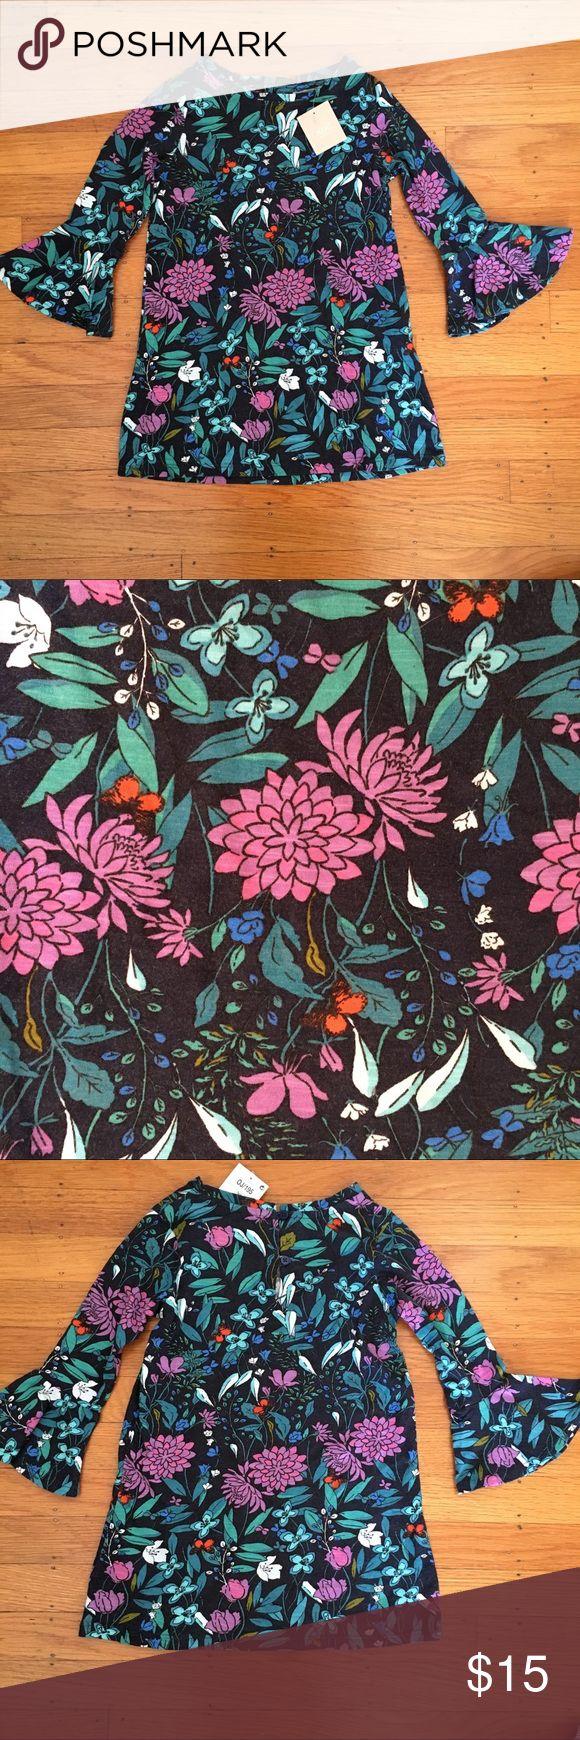 Girls tee shirt dress Navy teal and purple floral print tee shirt tunic dress with ruffle sleeves. next Dresses